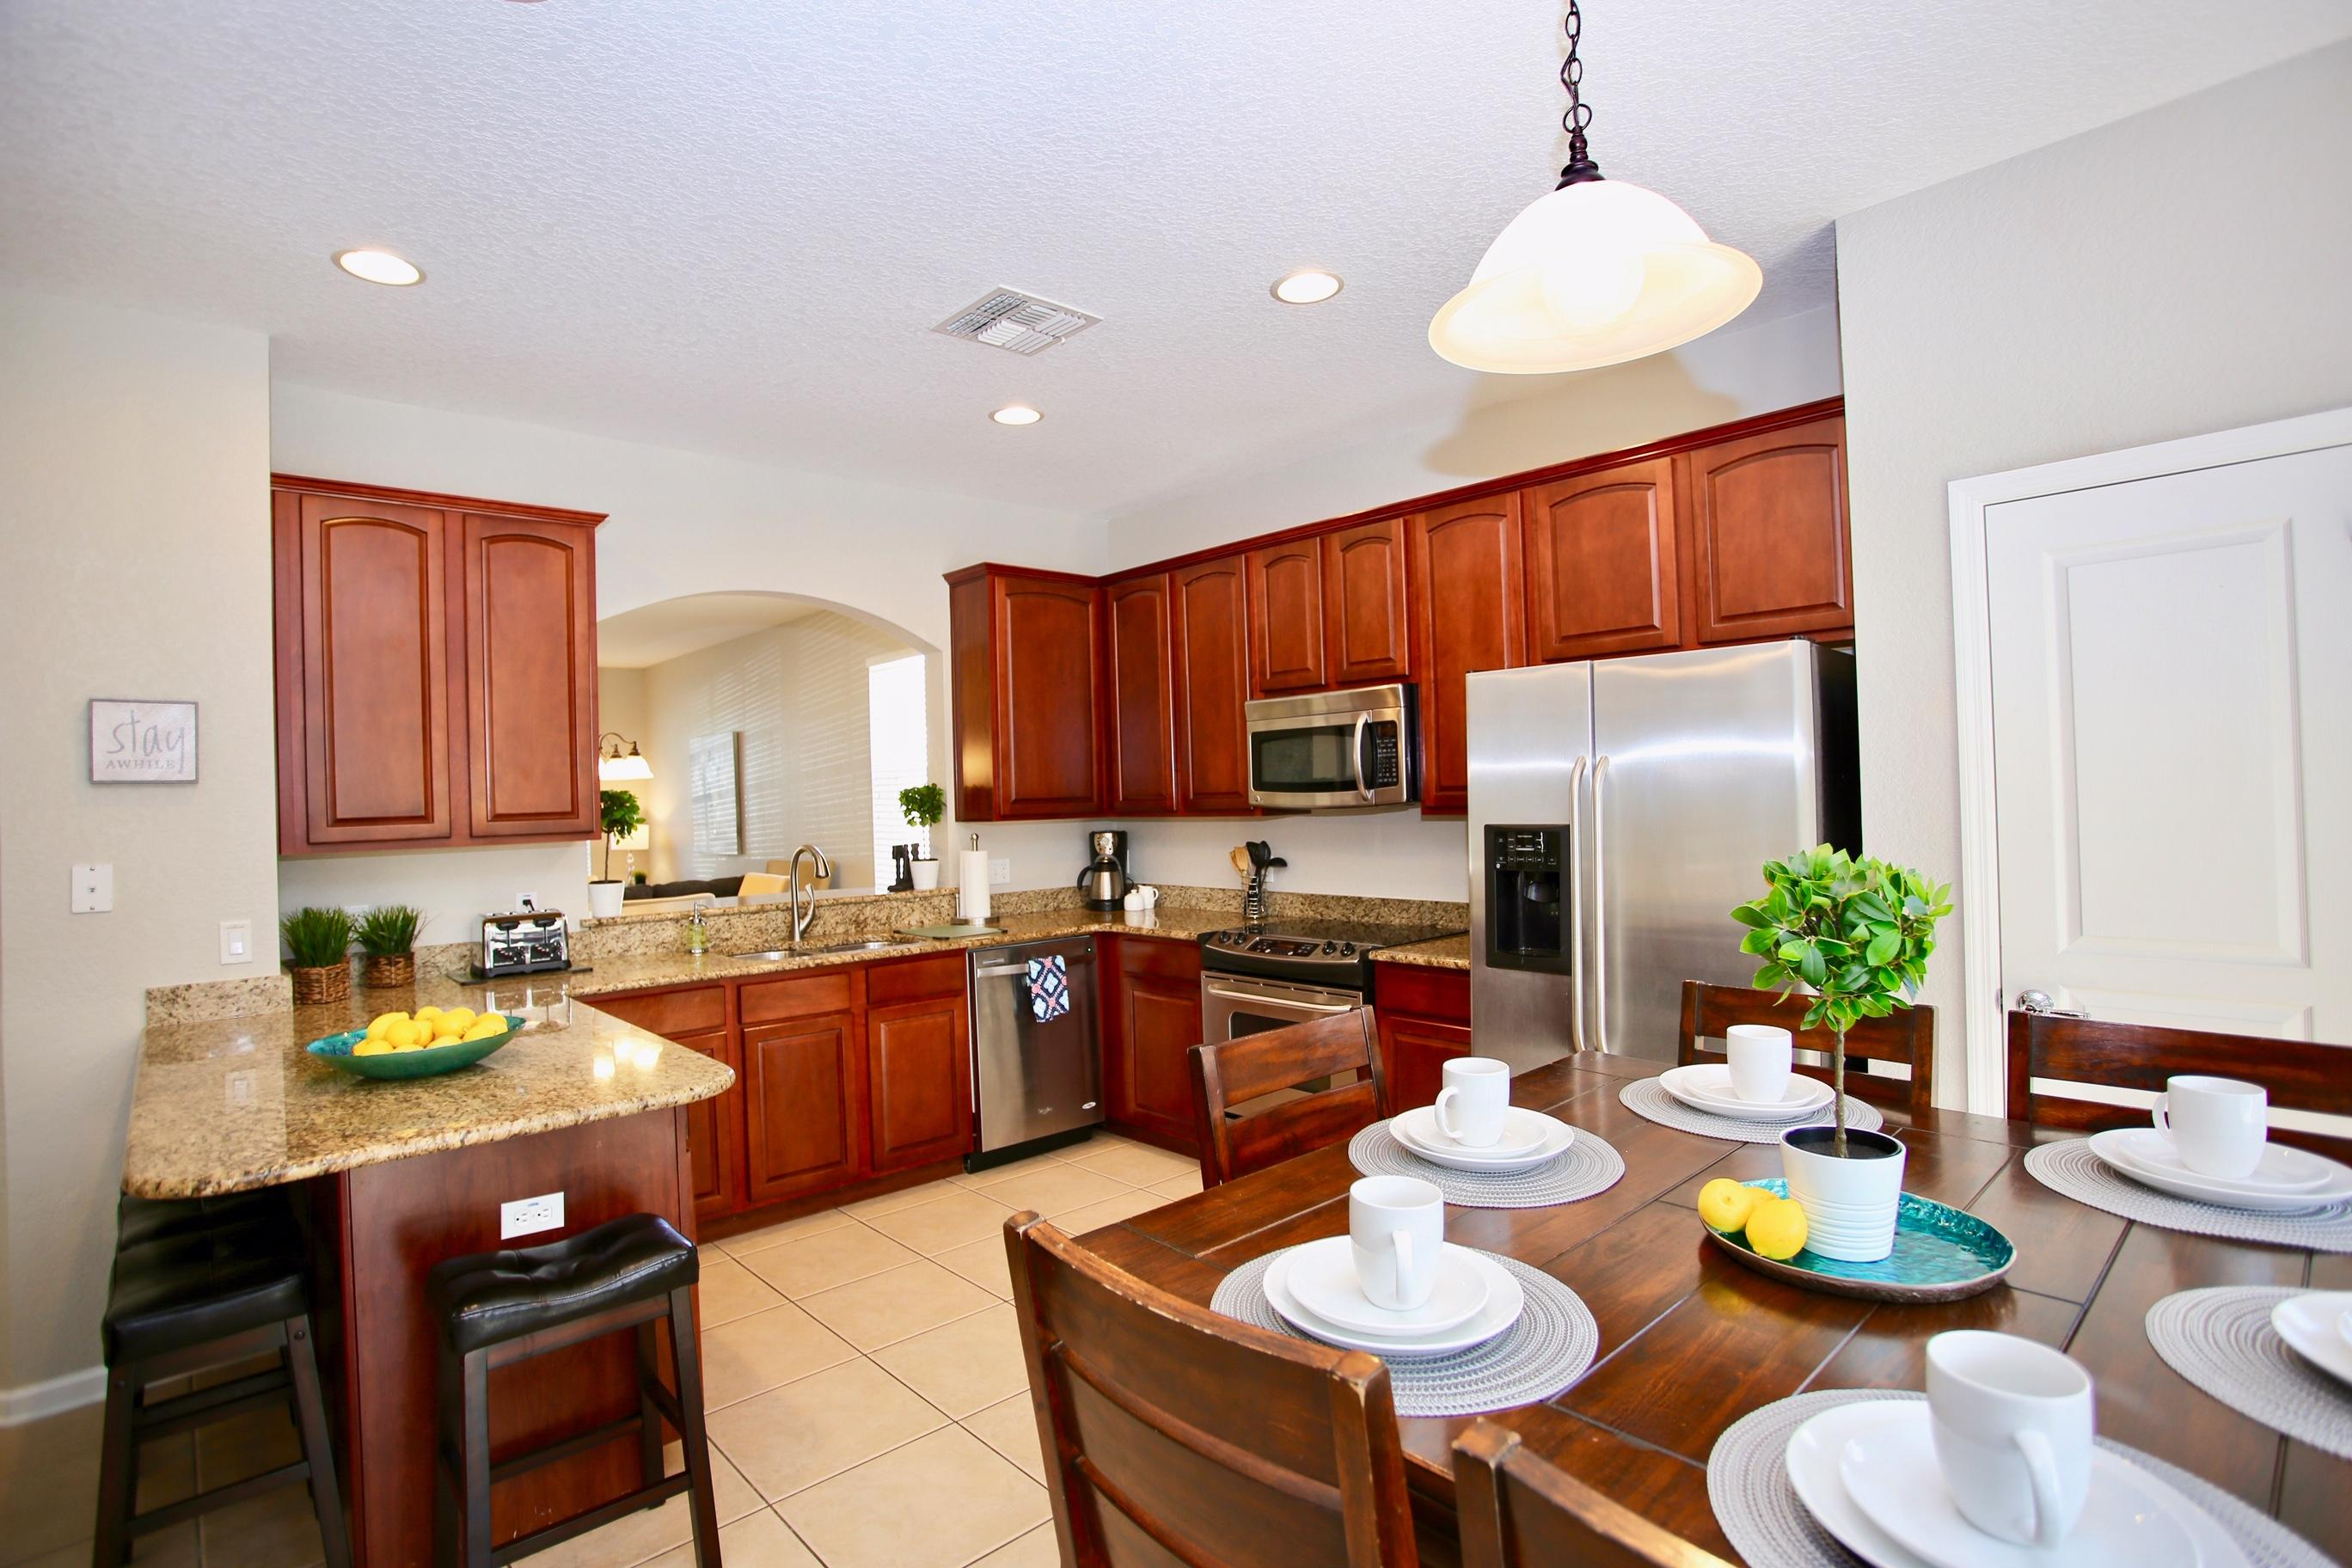 Large Kitchen for gathering